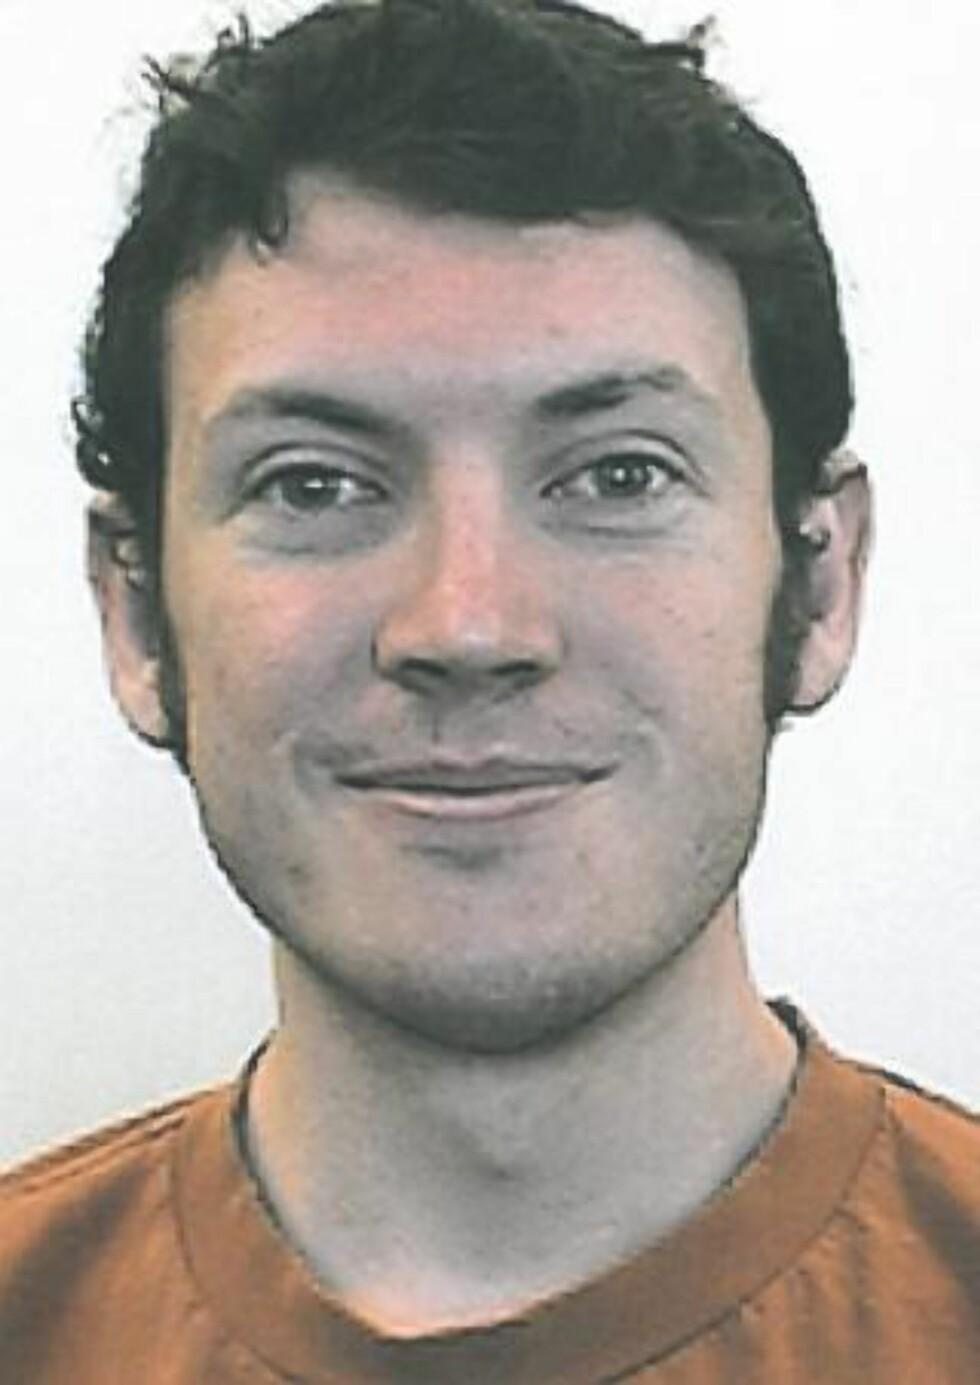 DRAPSMANNEN: James Holmes (24) drepte 12 og skadet 58. Foto: EPA/UNIVERSITY OF COLORADO HANDOUT EDITORIAL USE ONLY